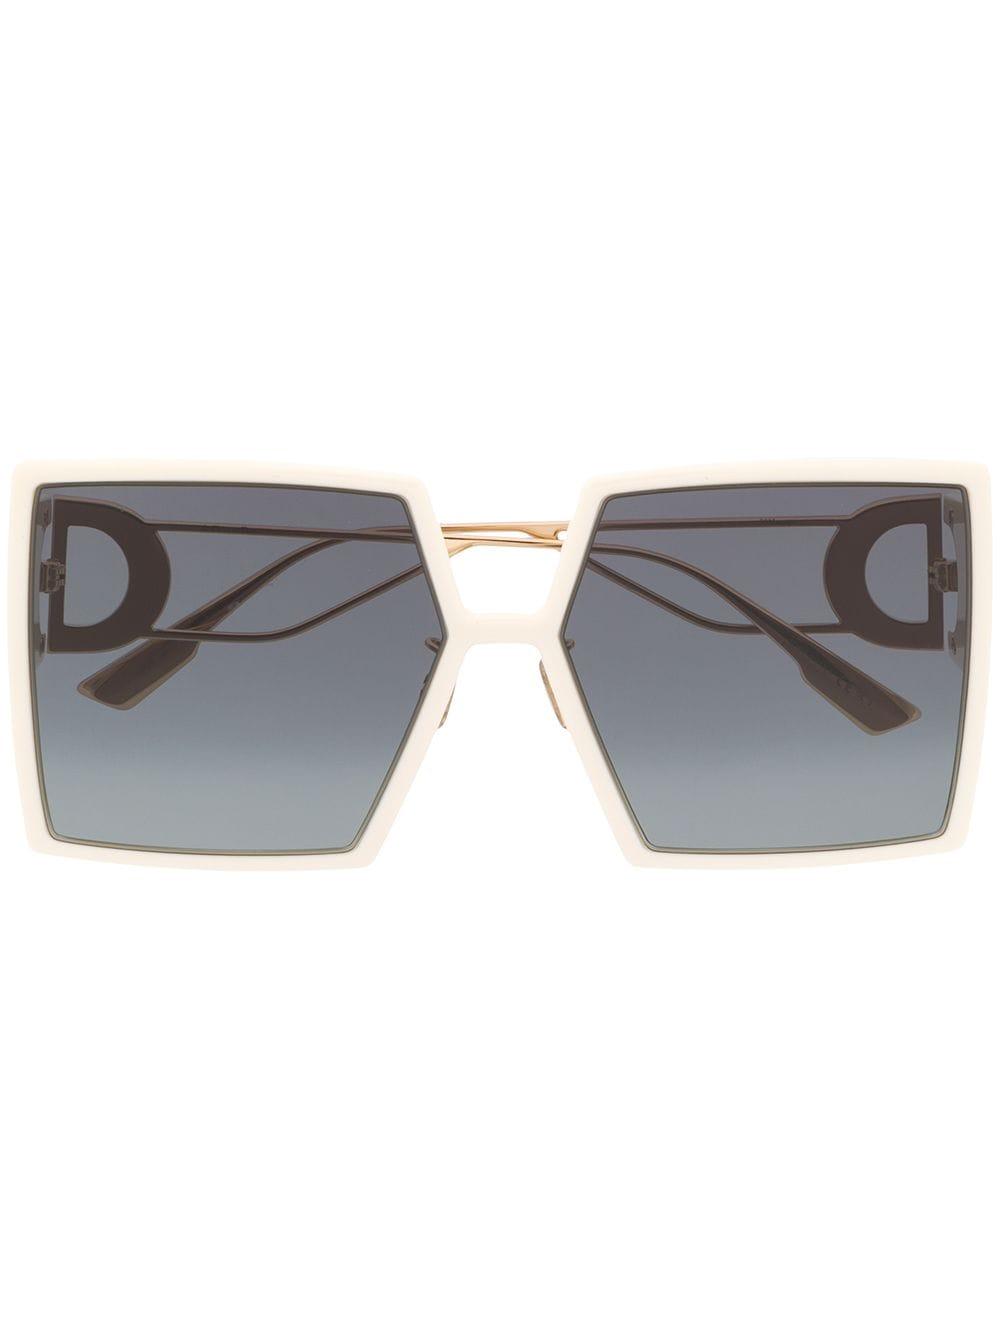 Christian Dior — 30 Montaigne Sunglasses